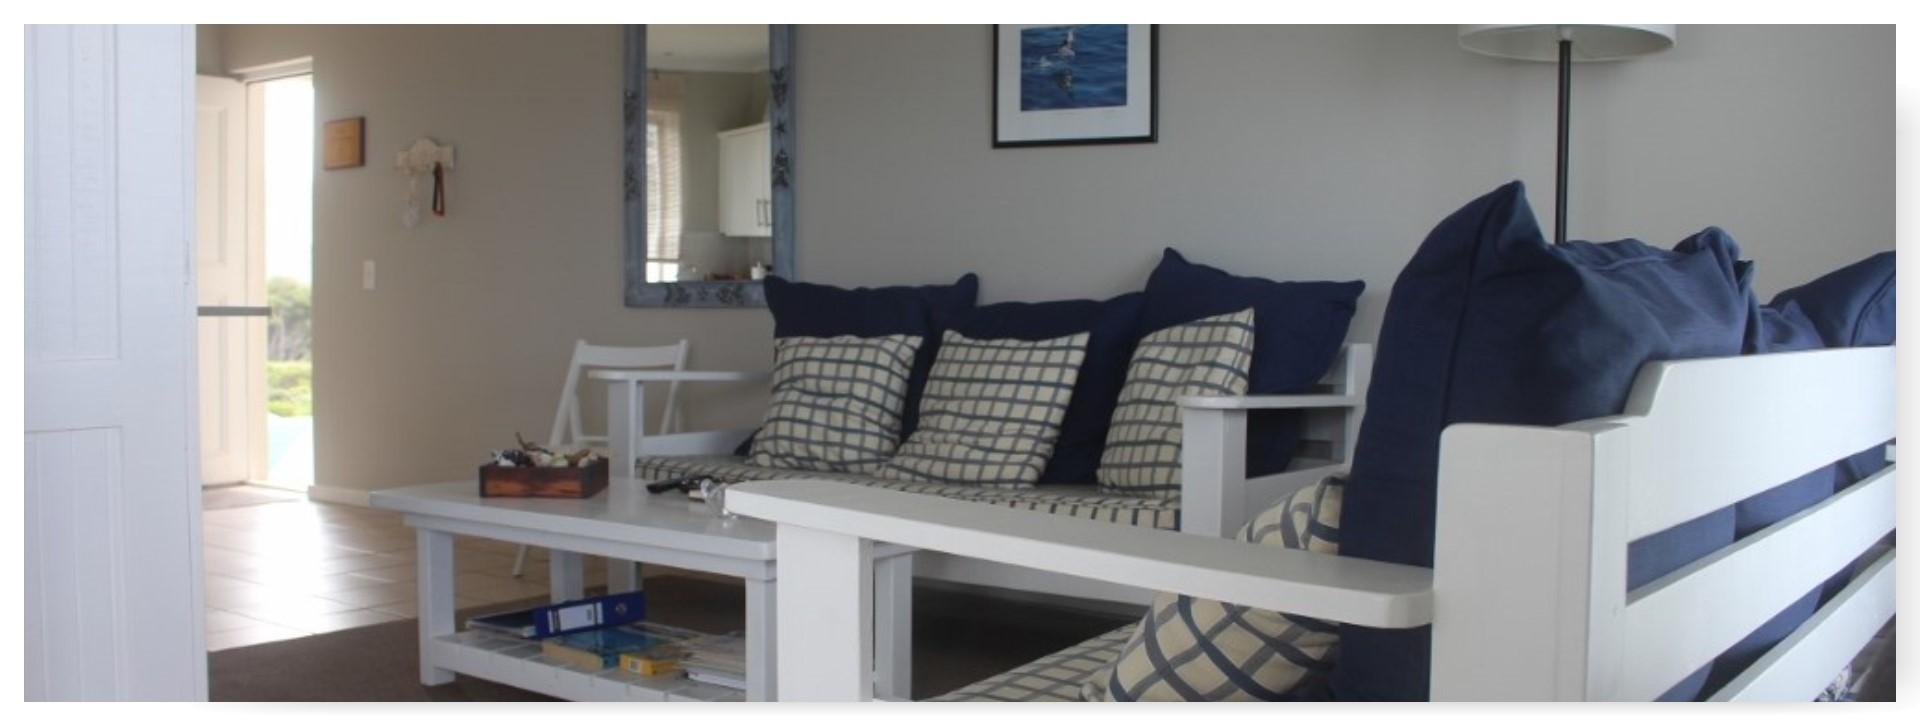 Spacious open plan living room</strong>